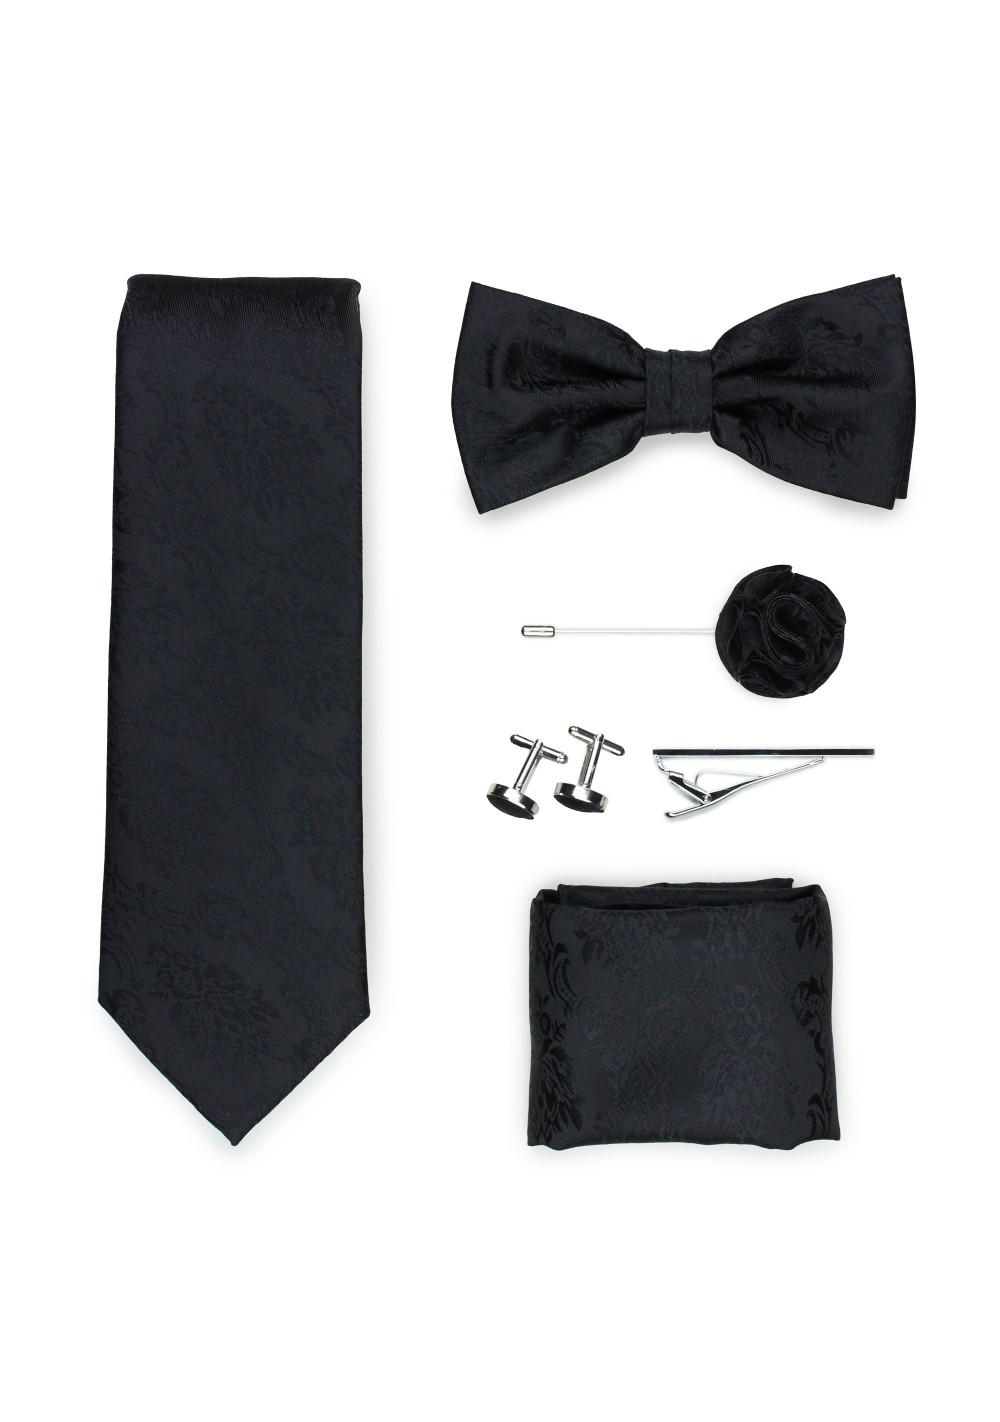 Wedding groomsmen gift set in black paisley